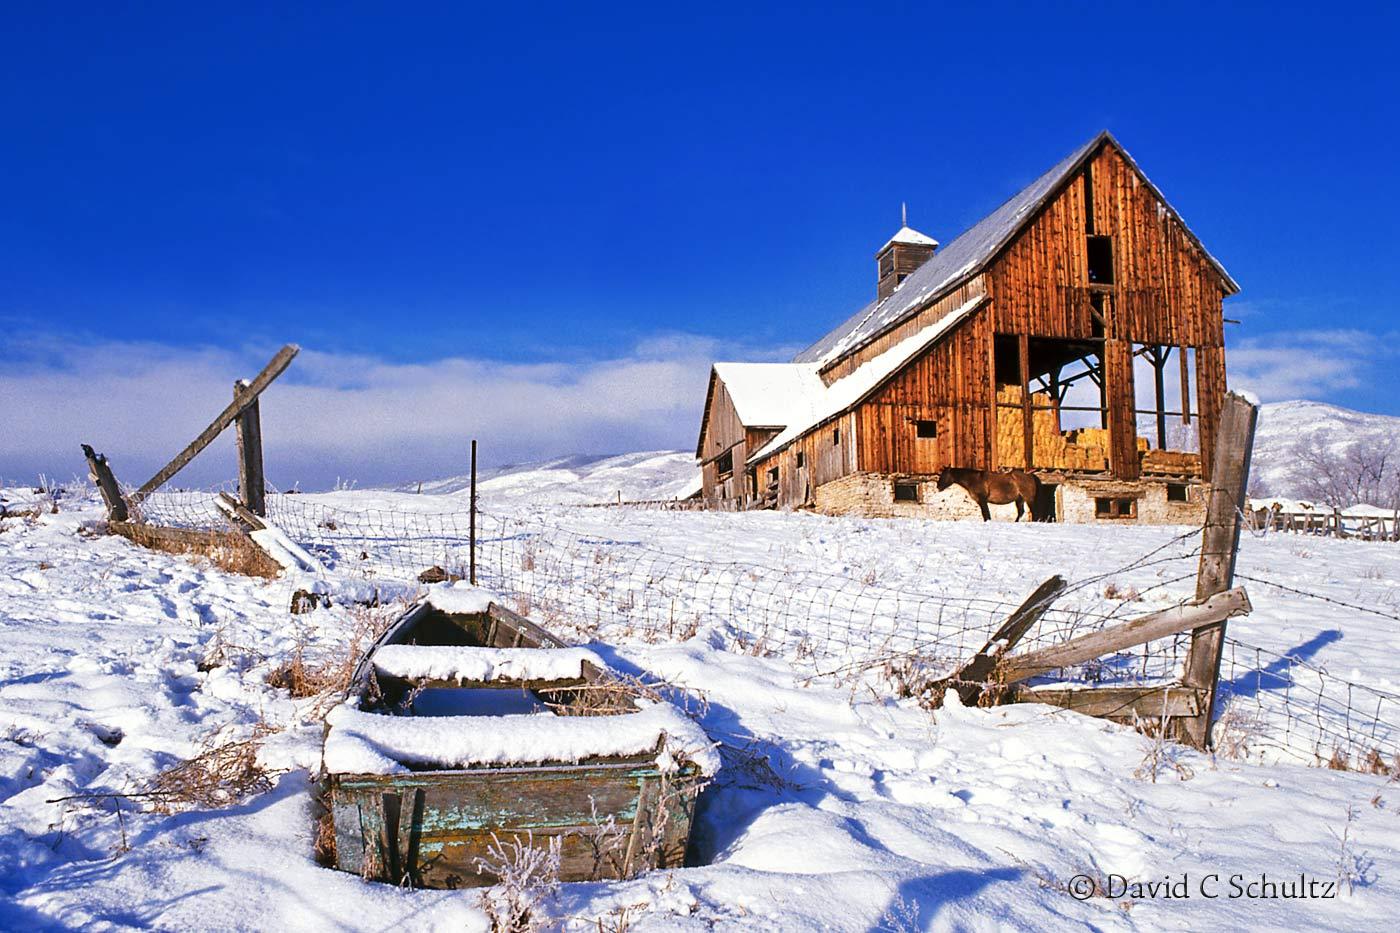 Winter at the Tate Barn Heber Valley Utah - Image #13-585